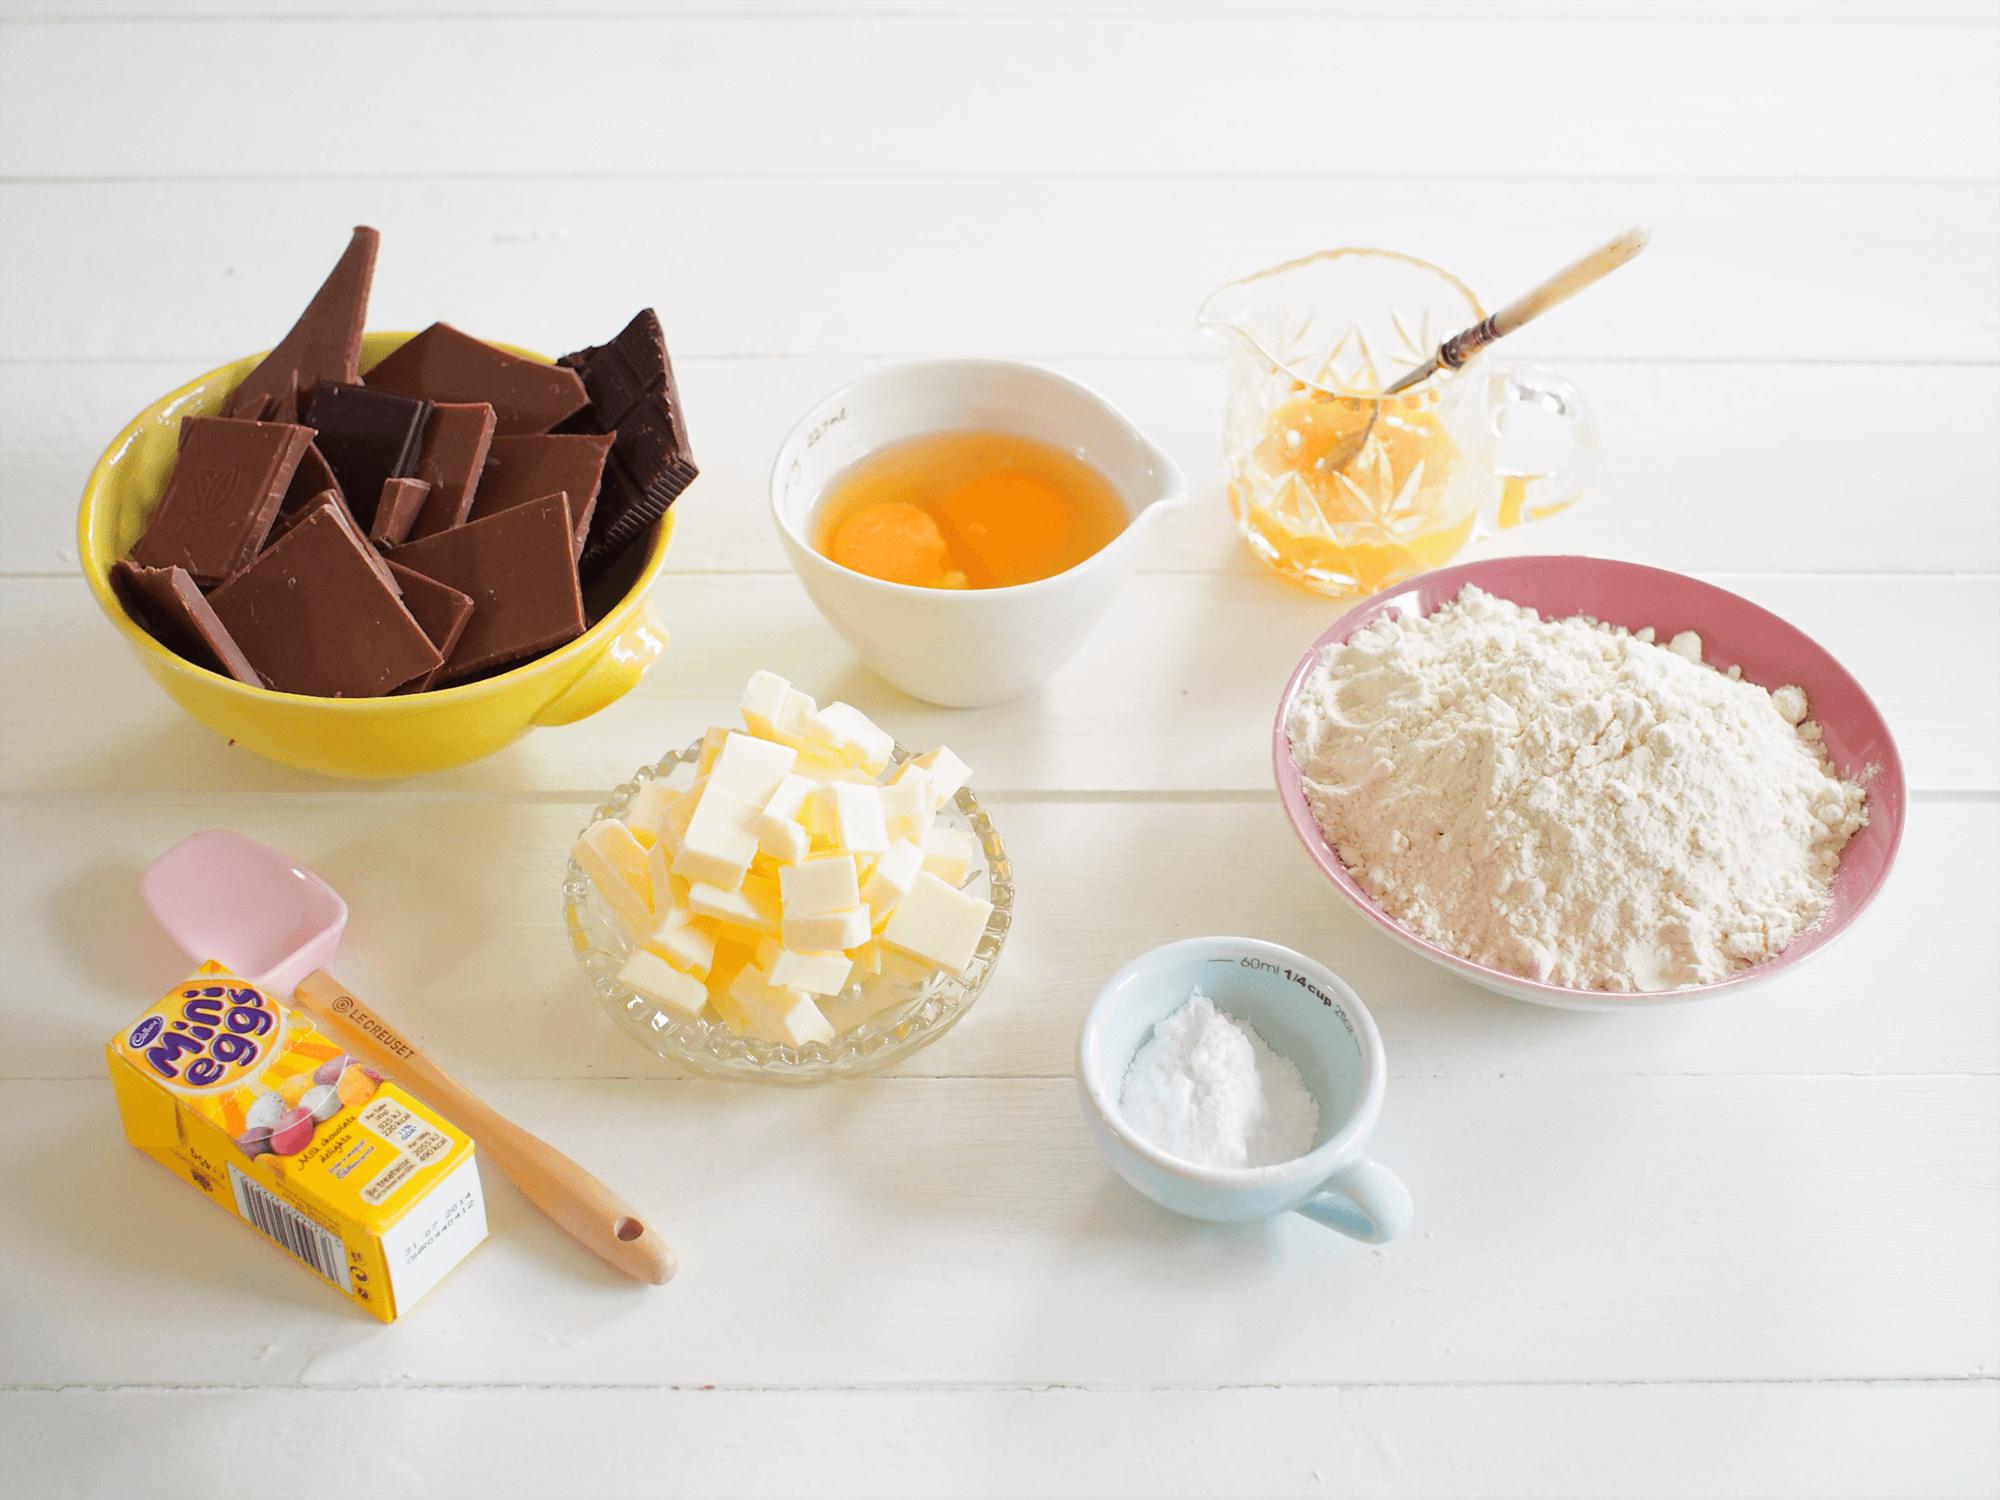 Chocolate Mini Egg Tart - About Time Magazine (1)